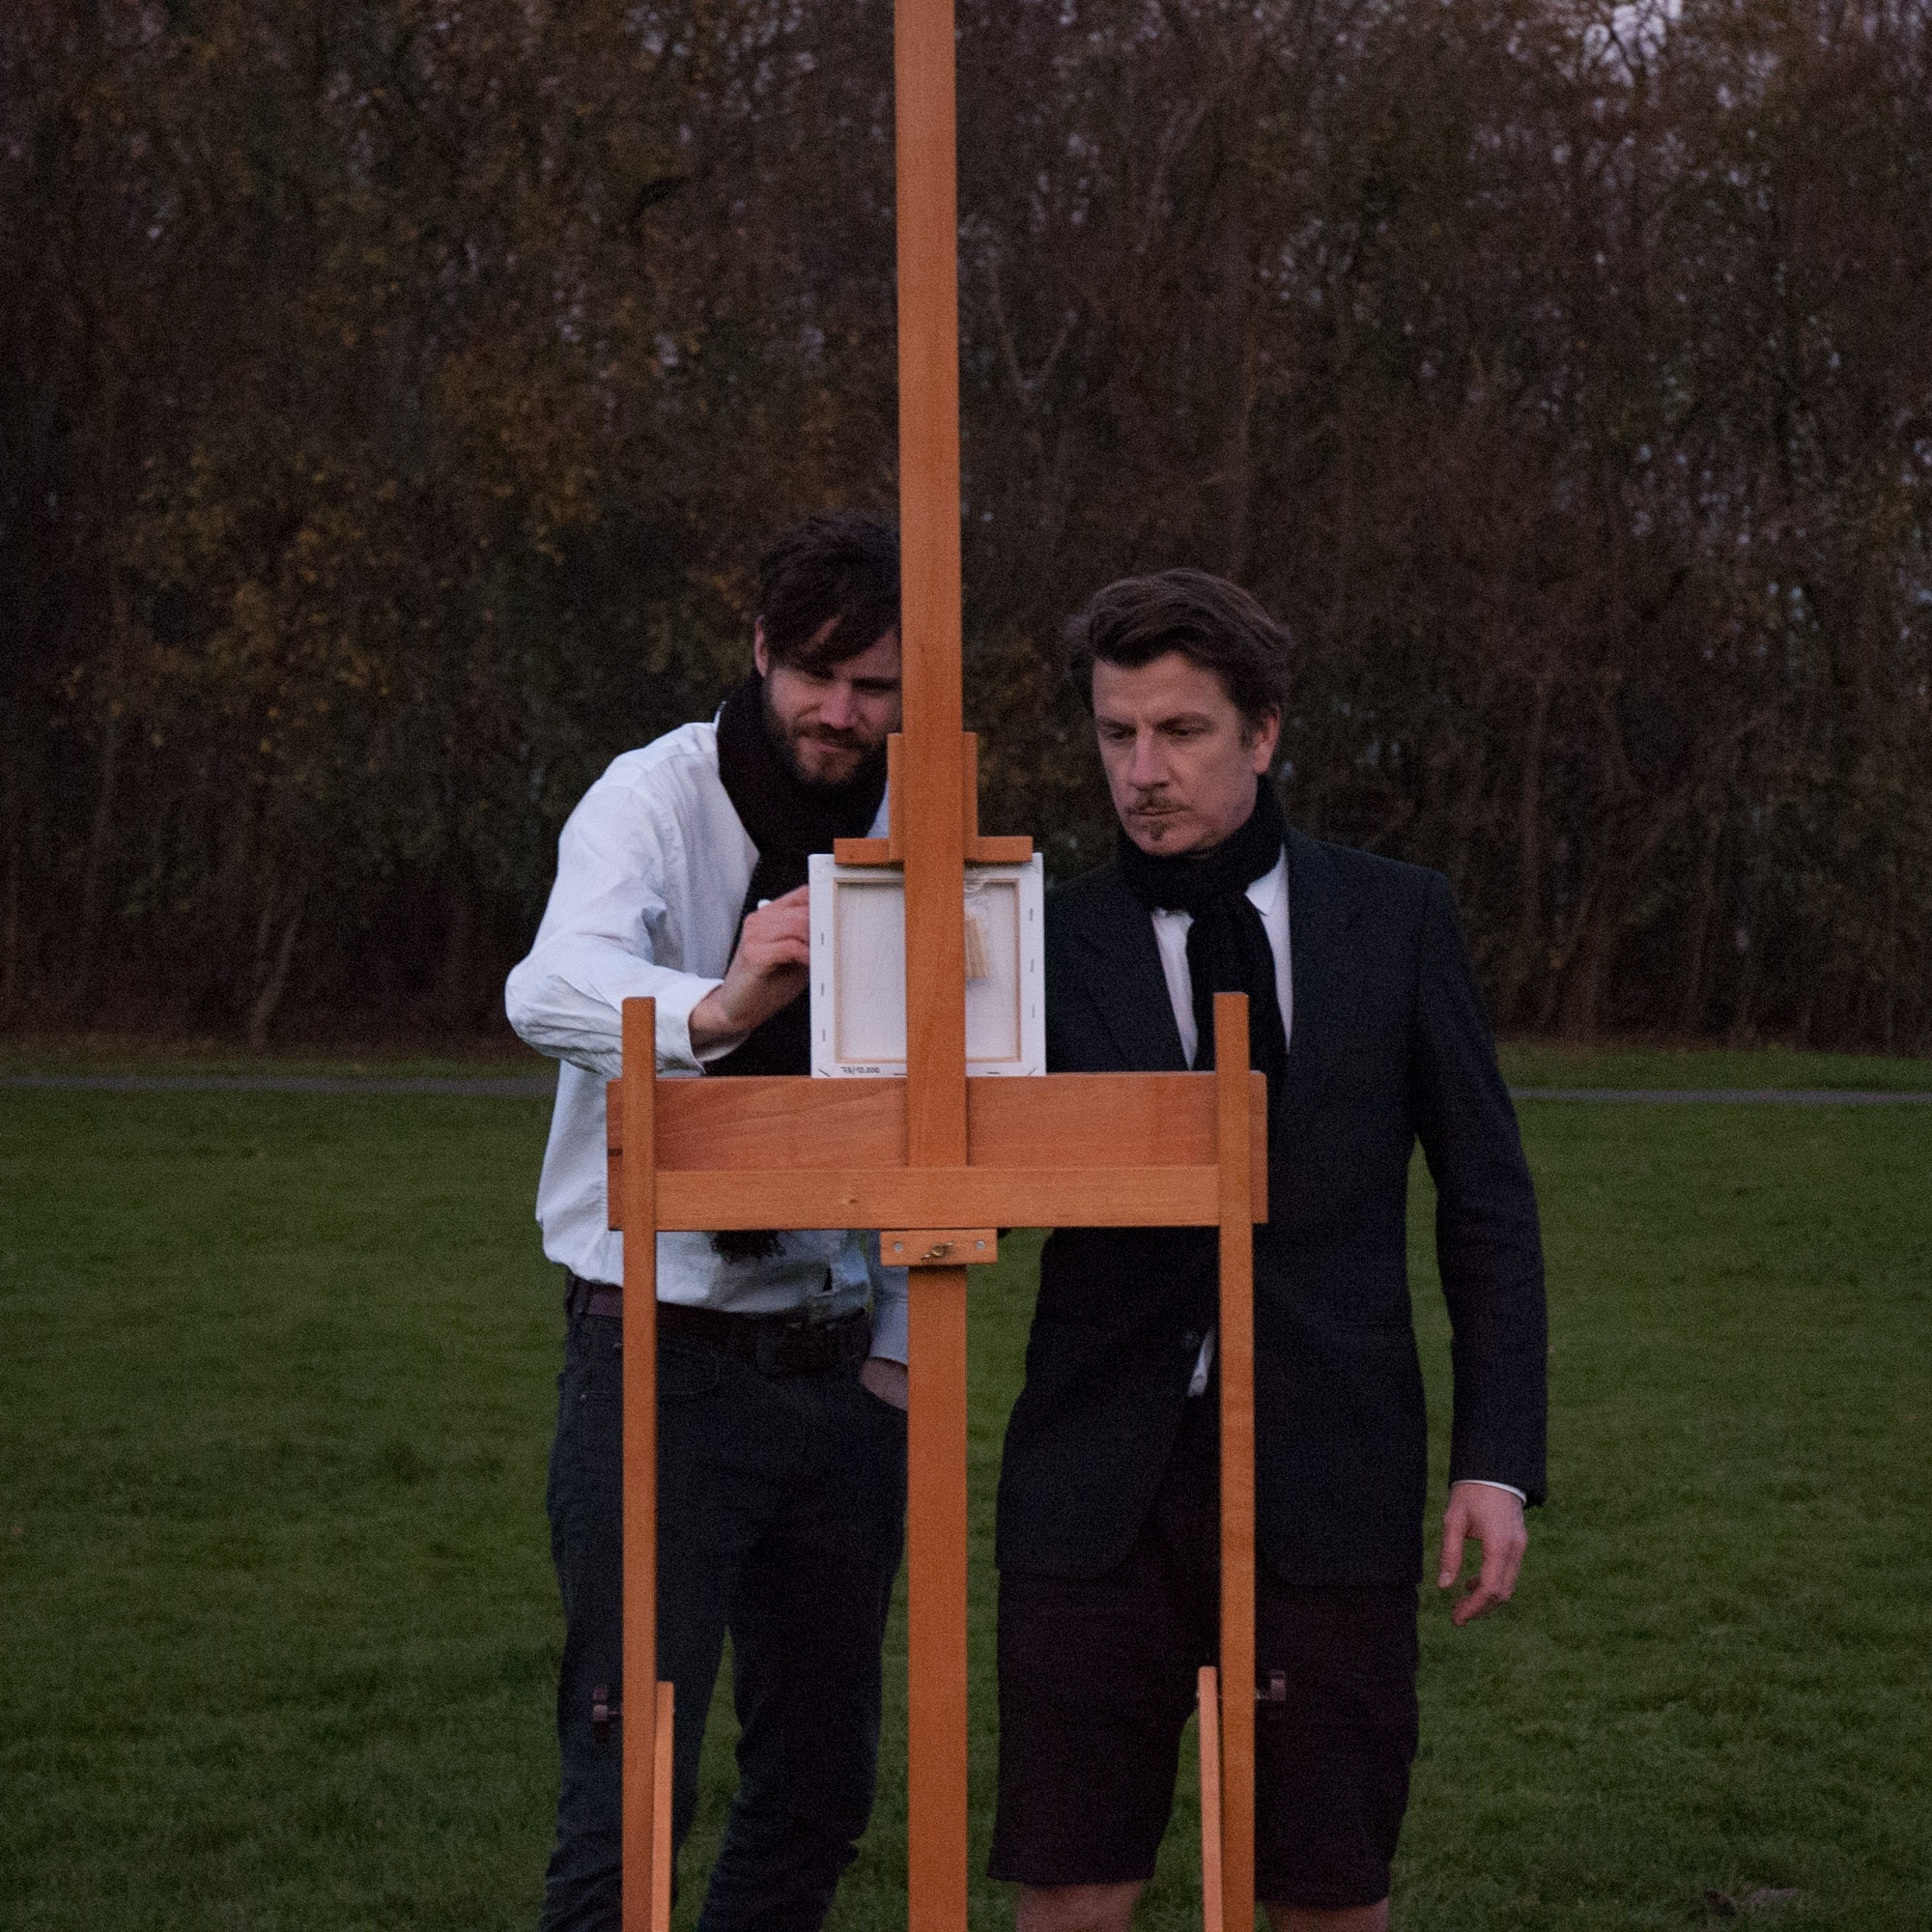 Jens Ole Mayer & Beni von Alemann